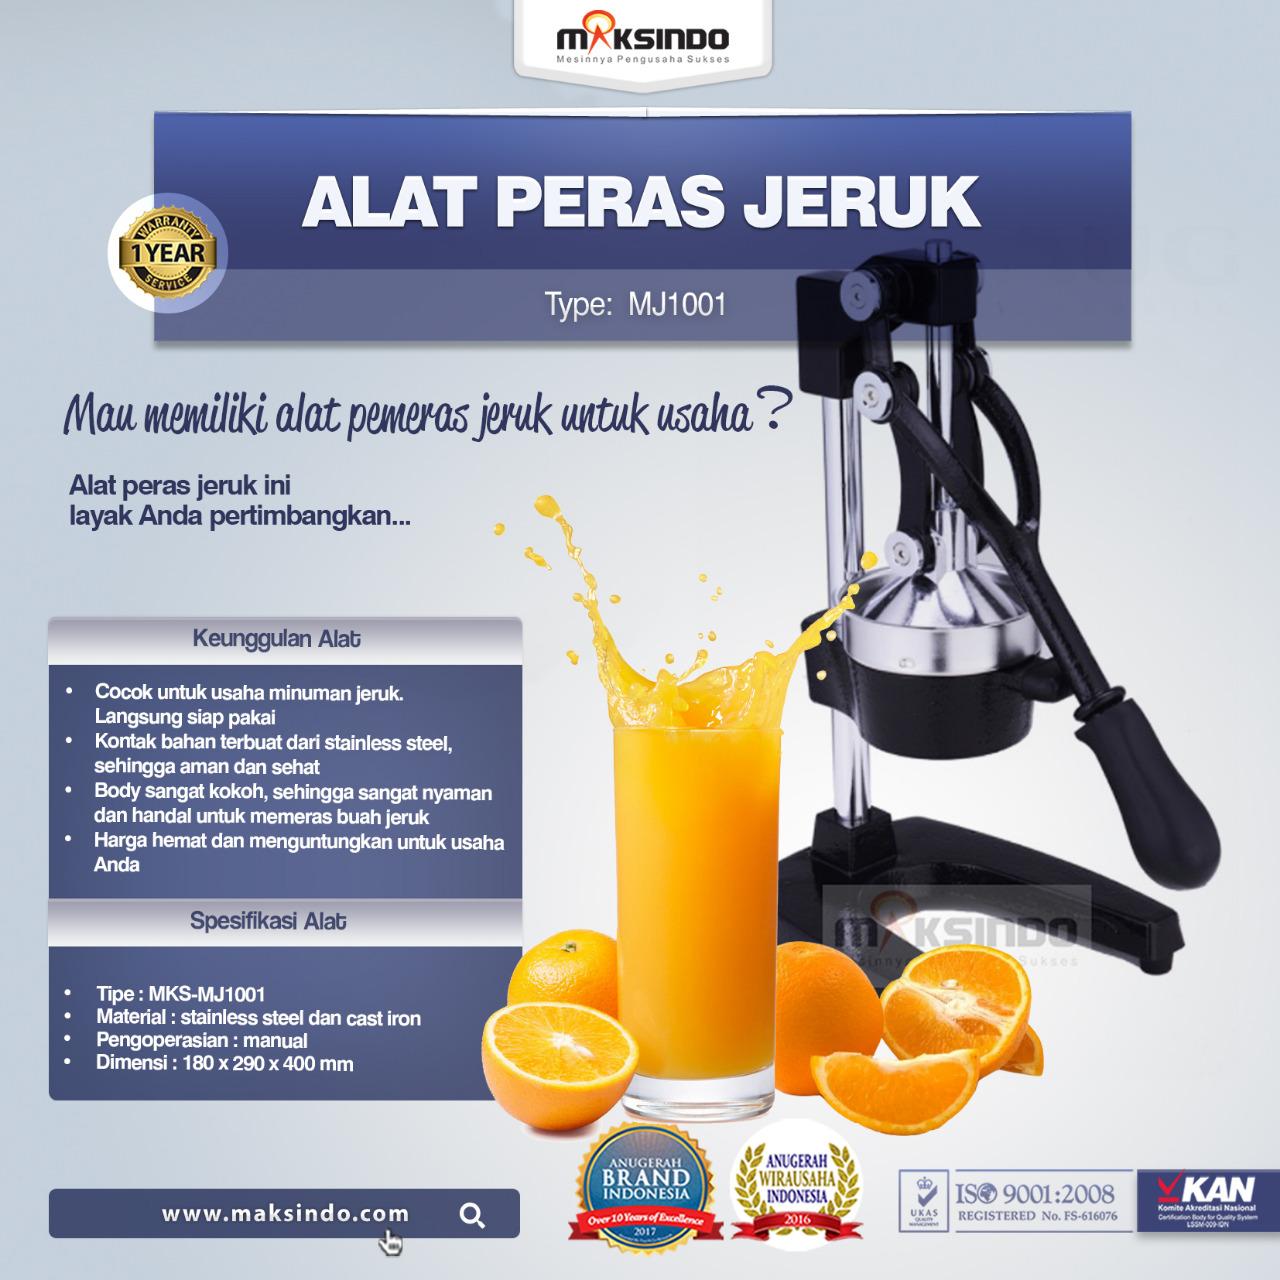 Jual Alat Pemeras Jeruk Manual (MJ1001) di pekanbaru